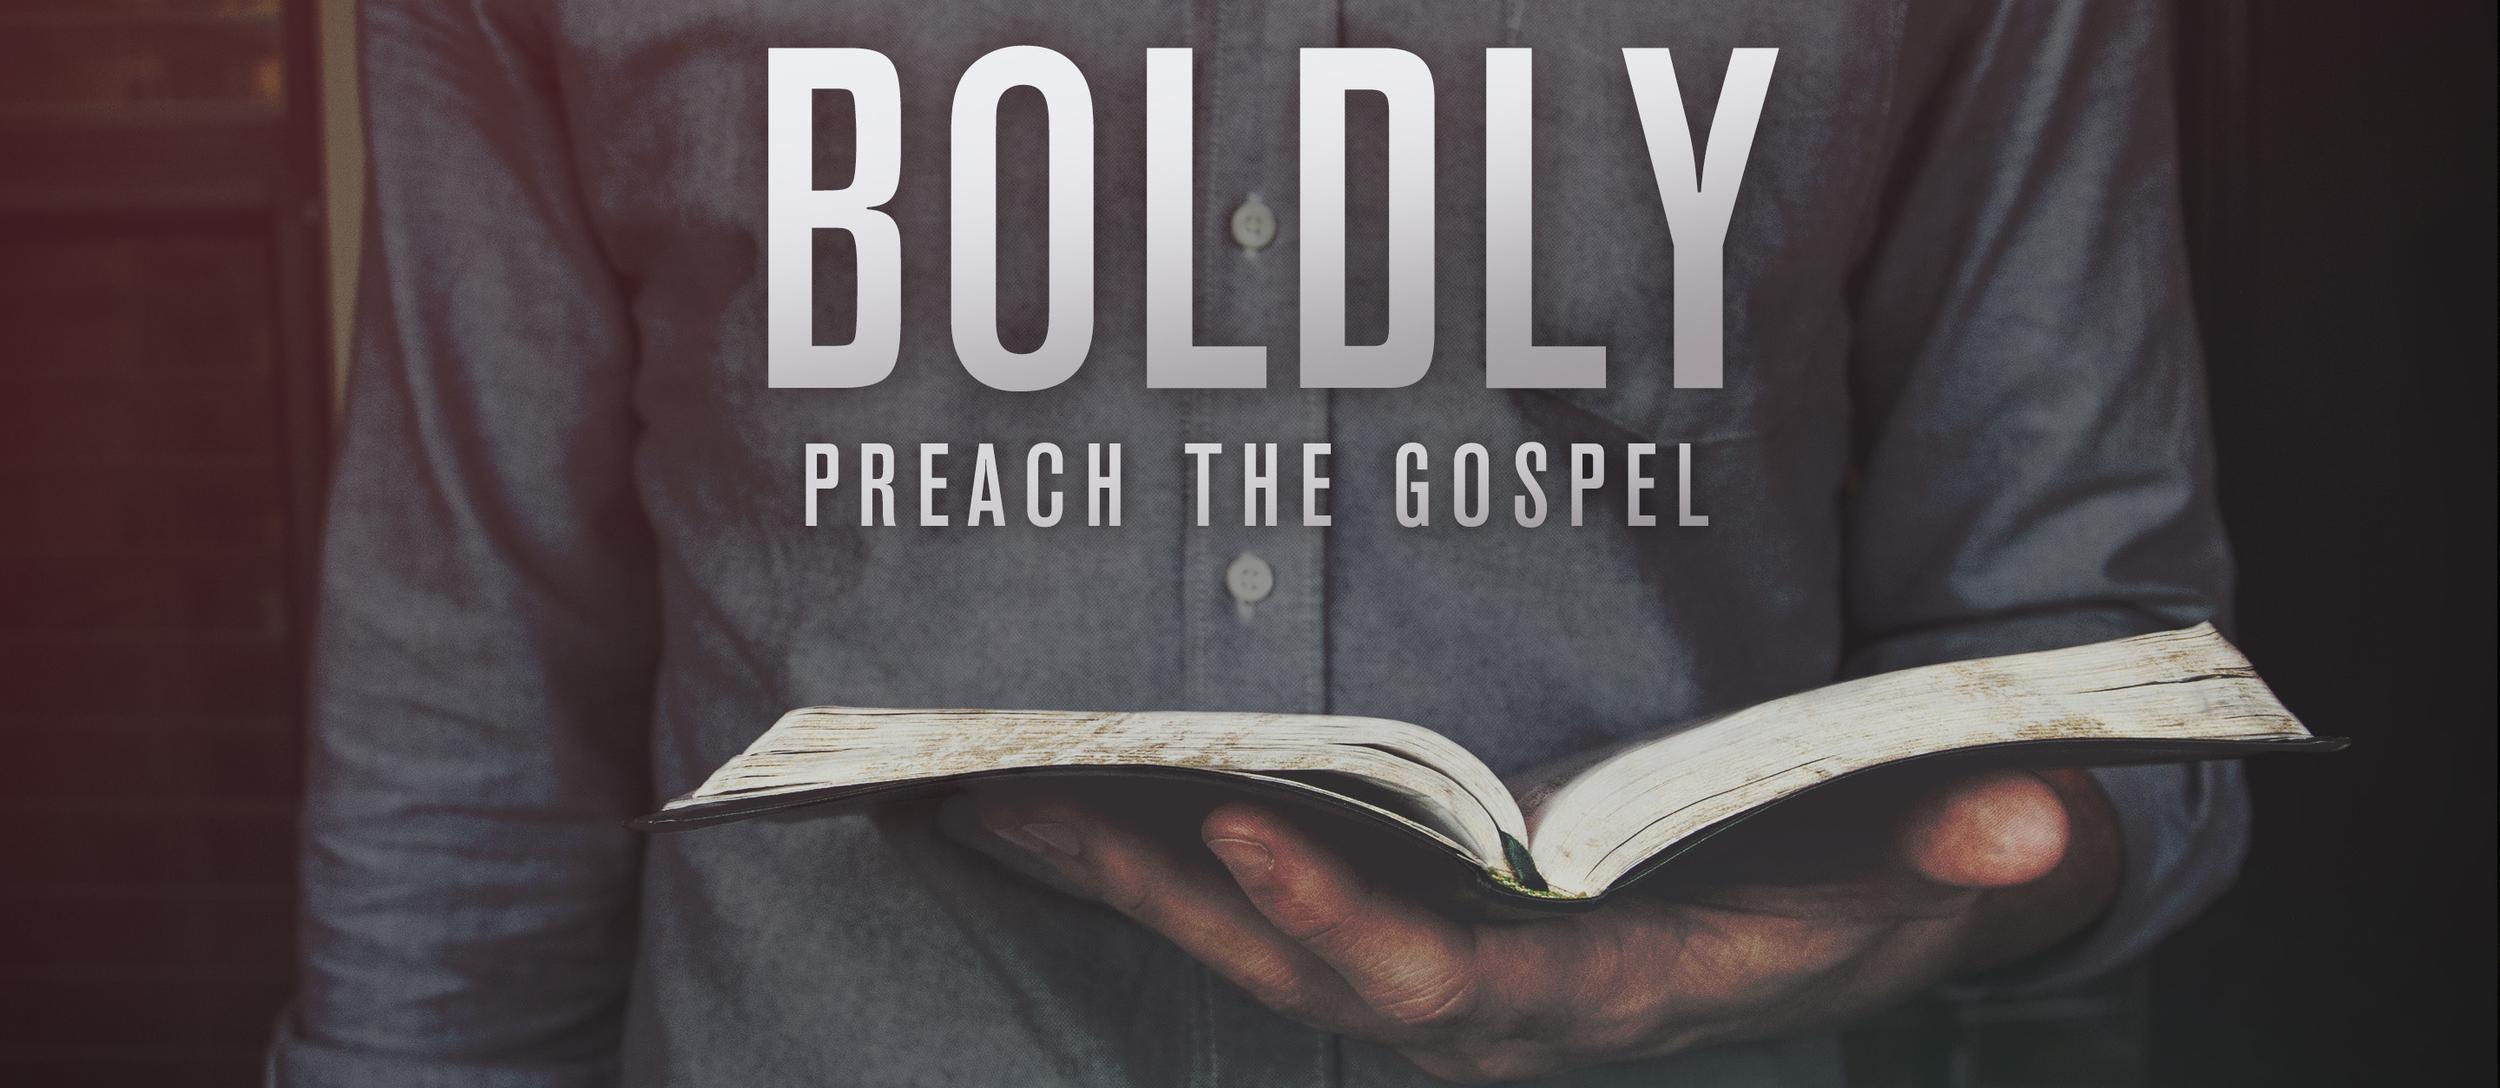 Boldly_Preach_The_Gospel_wide_t_nv.jpg